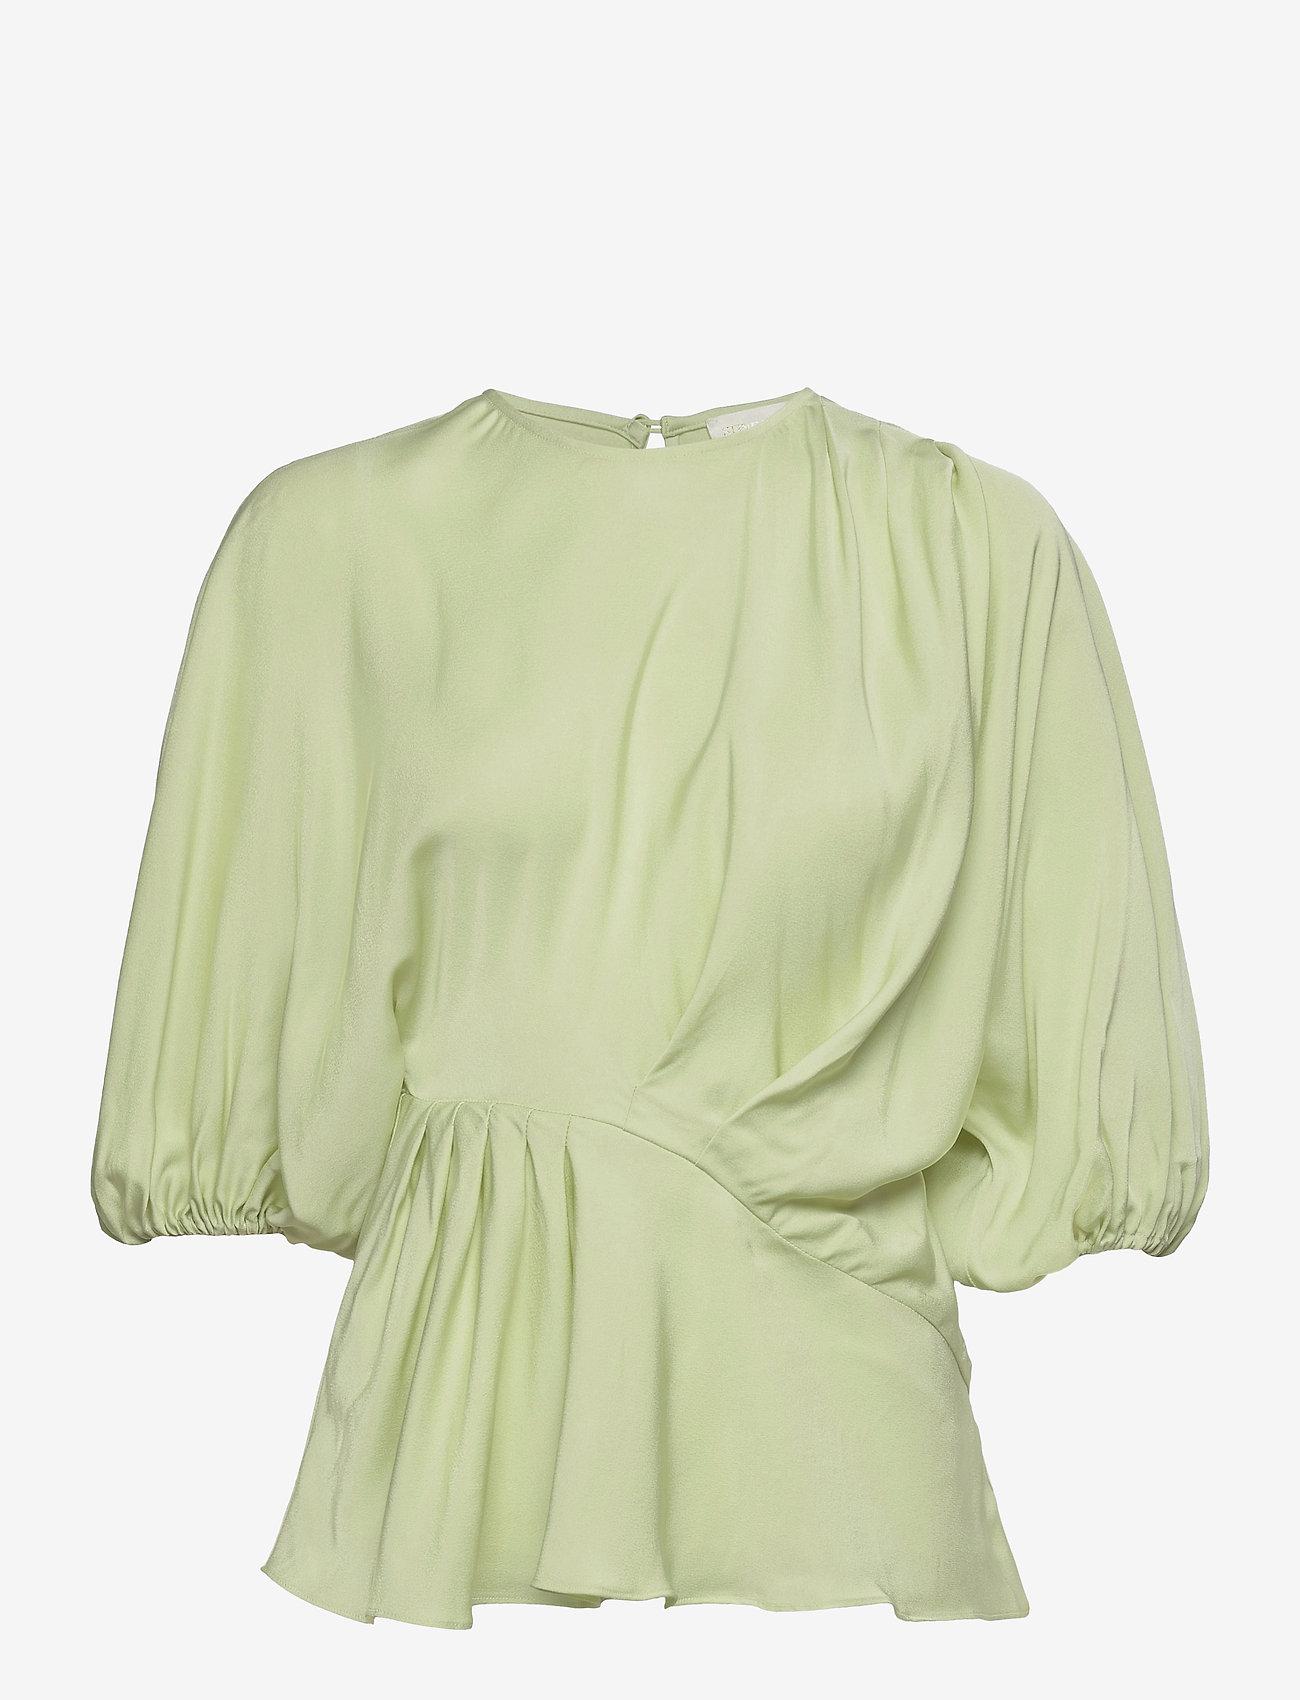 STINE GOYA - Cora, 1110 Viscose Twill - kortærmede bluser - fog green - 1